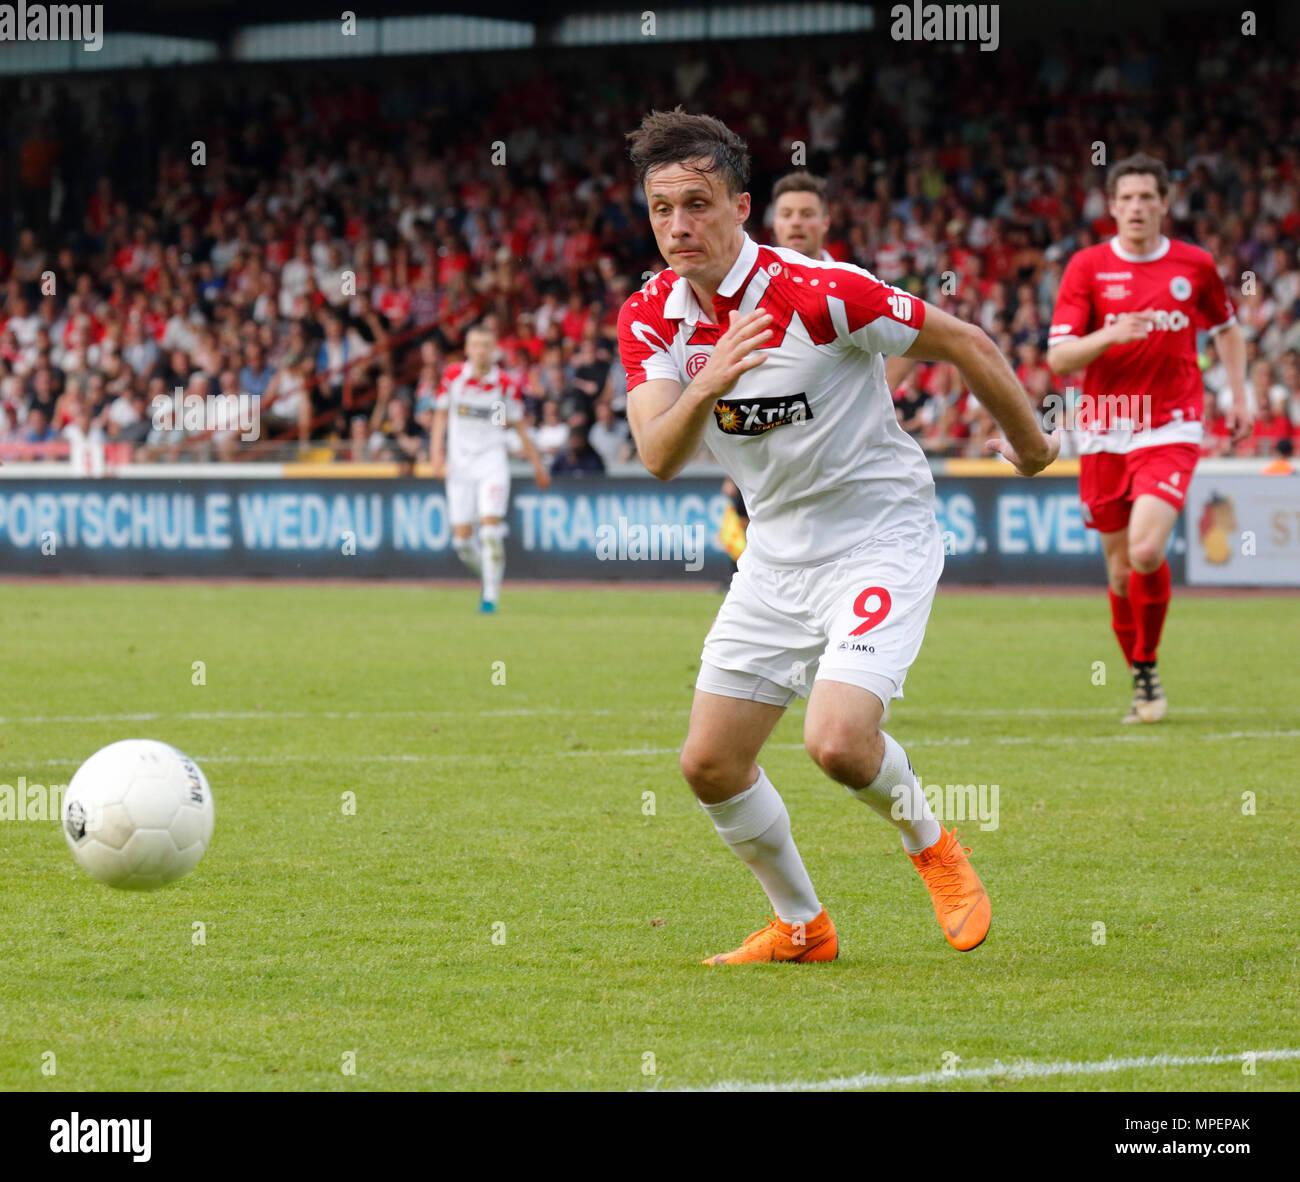 sports, football, Lower Rhine Cup, 2017/2018, final, Rot-Weiss Oberhausen vs Rot Weiss Essen 2:1, Stadium Niederrhein Oberhausen, scene of the match, Marcel Platzek (RWE) - Stock Image